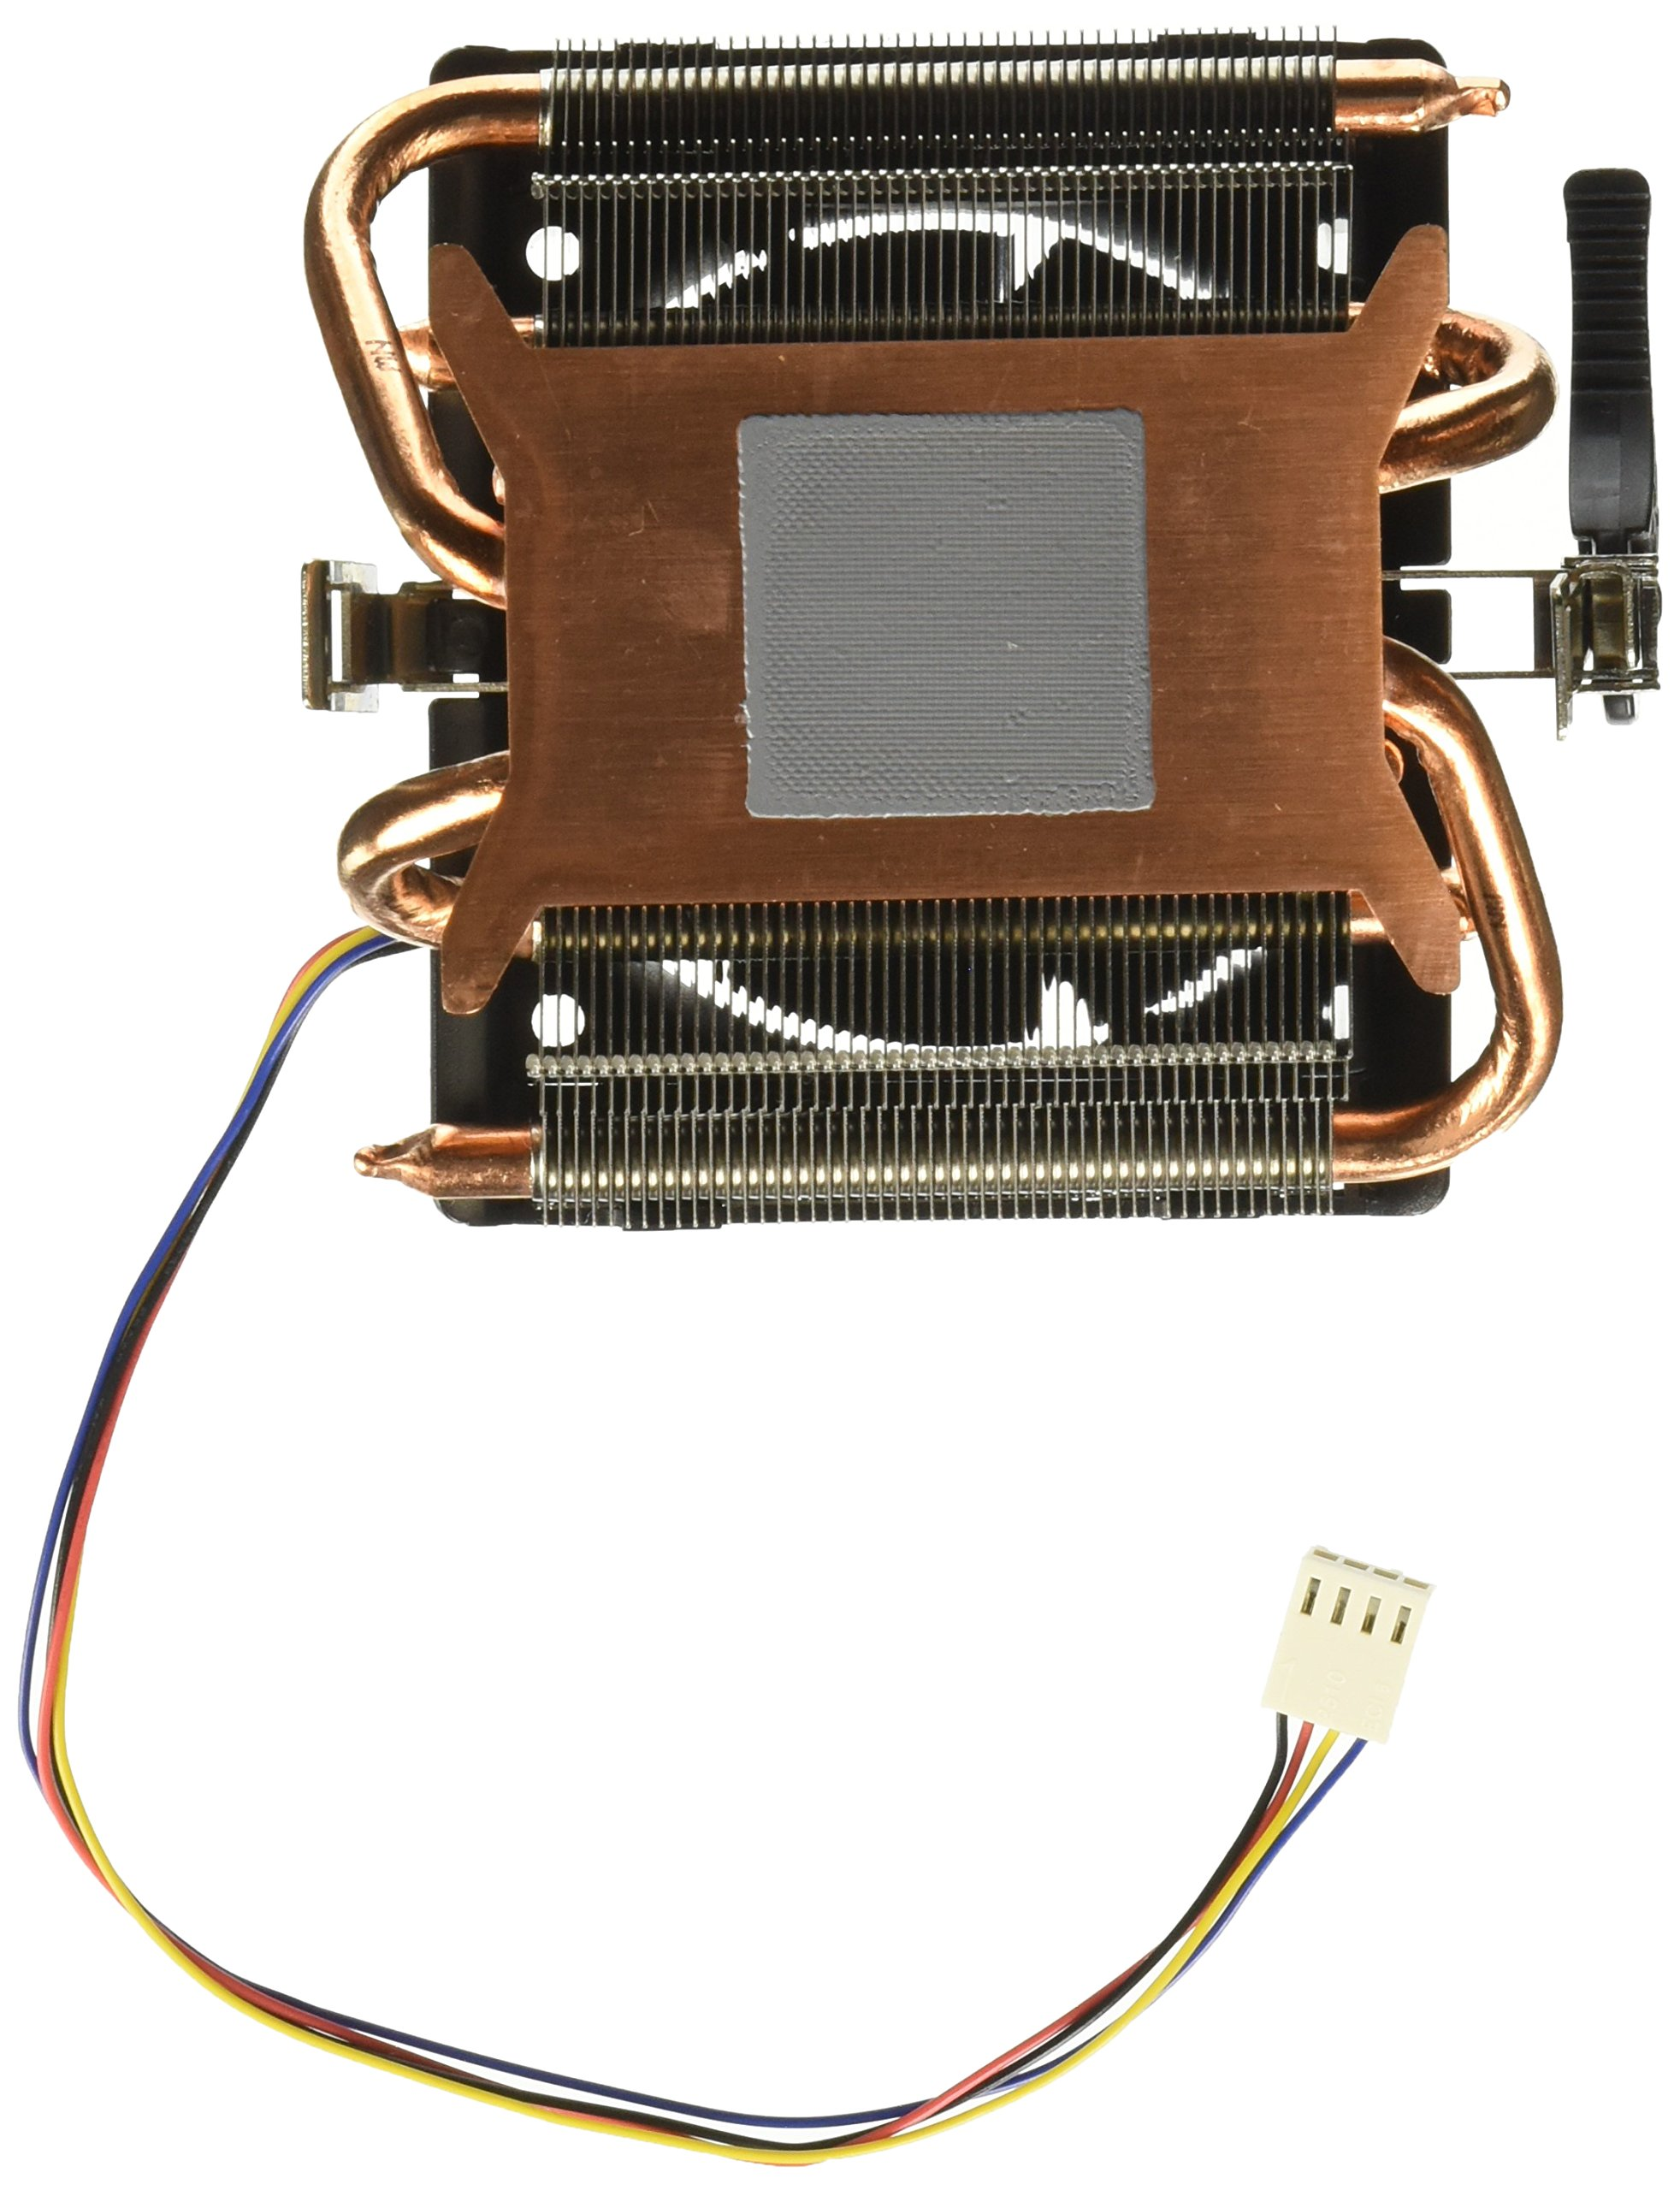 AMD FD8350FRHKBOX FX-8350  FX-Series 8-Core Black Edition Processor by AMD